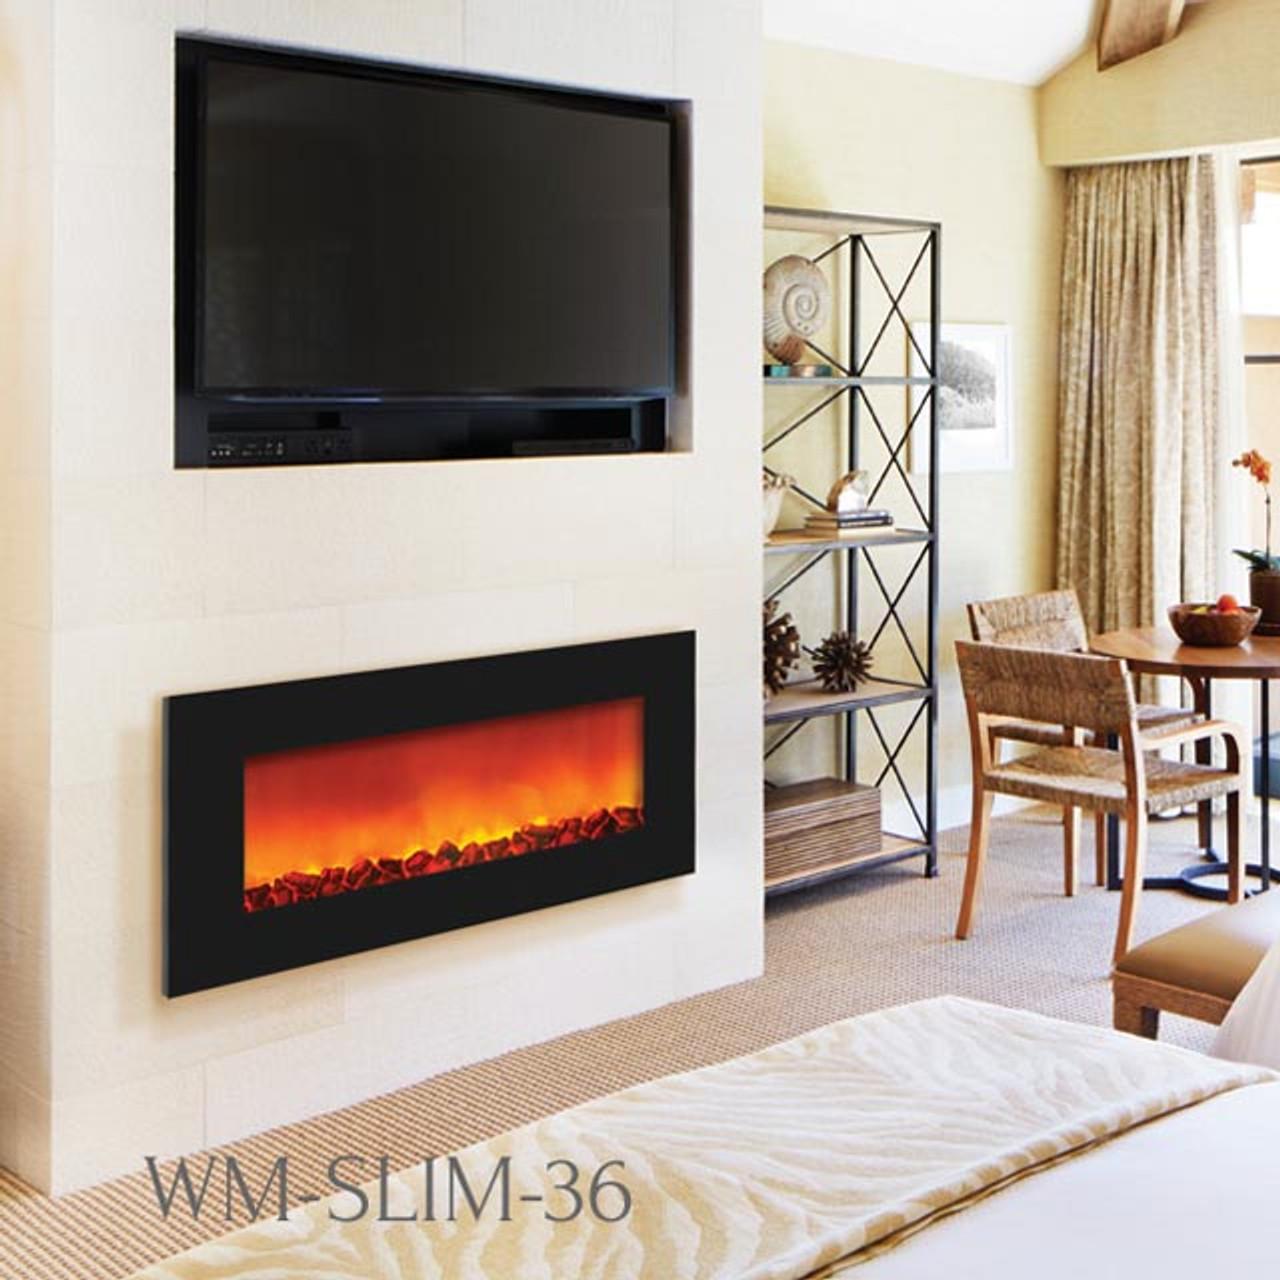 SIERRA FLAME WM-SLIM-36 SLIM WALL MOUNT ELECTRIC FIREPLACE